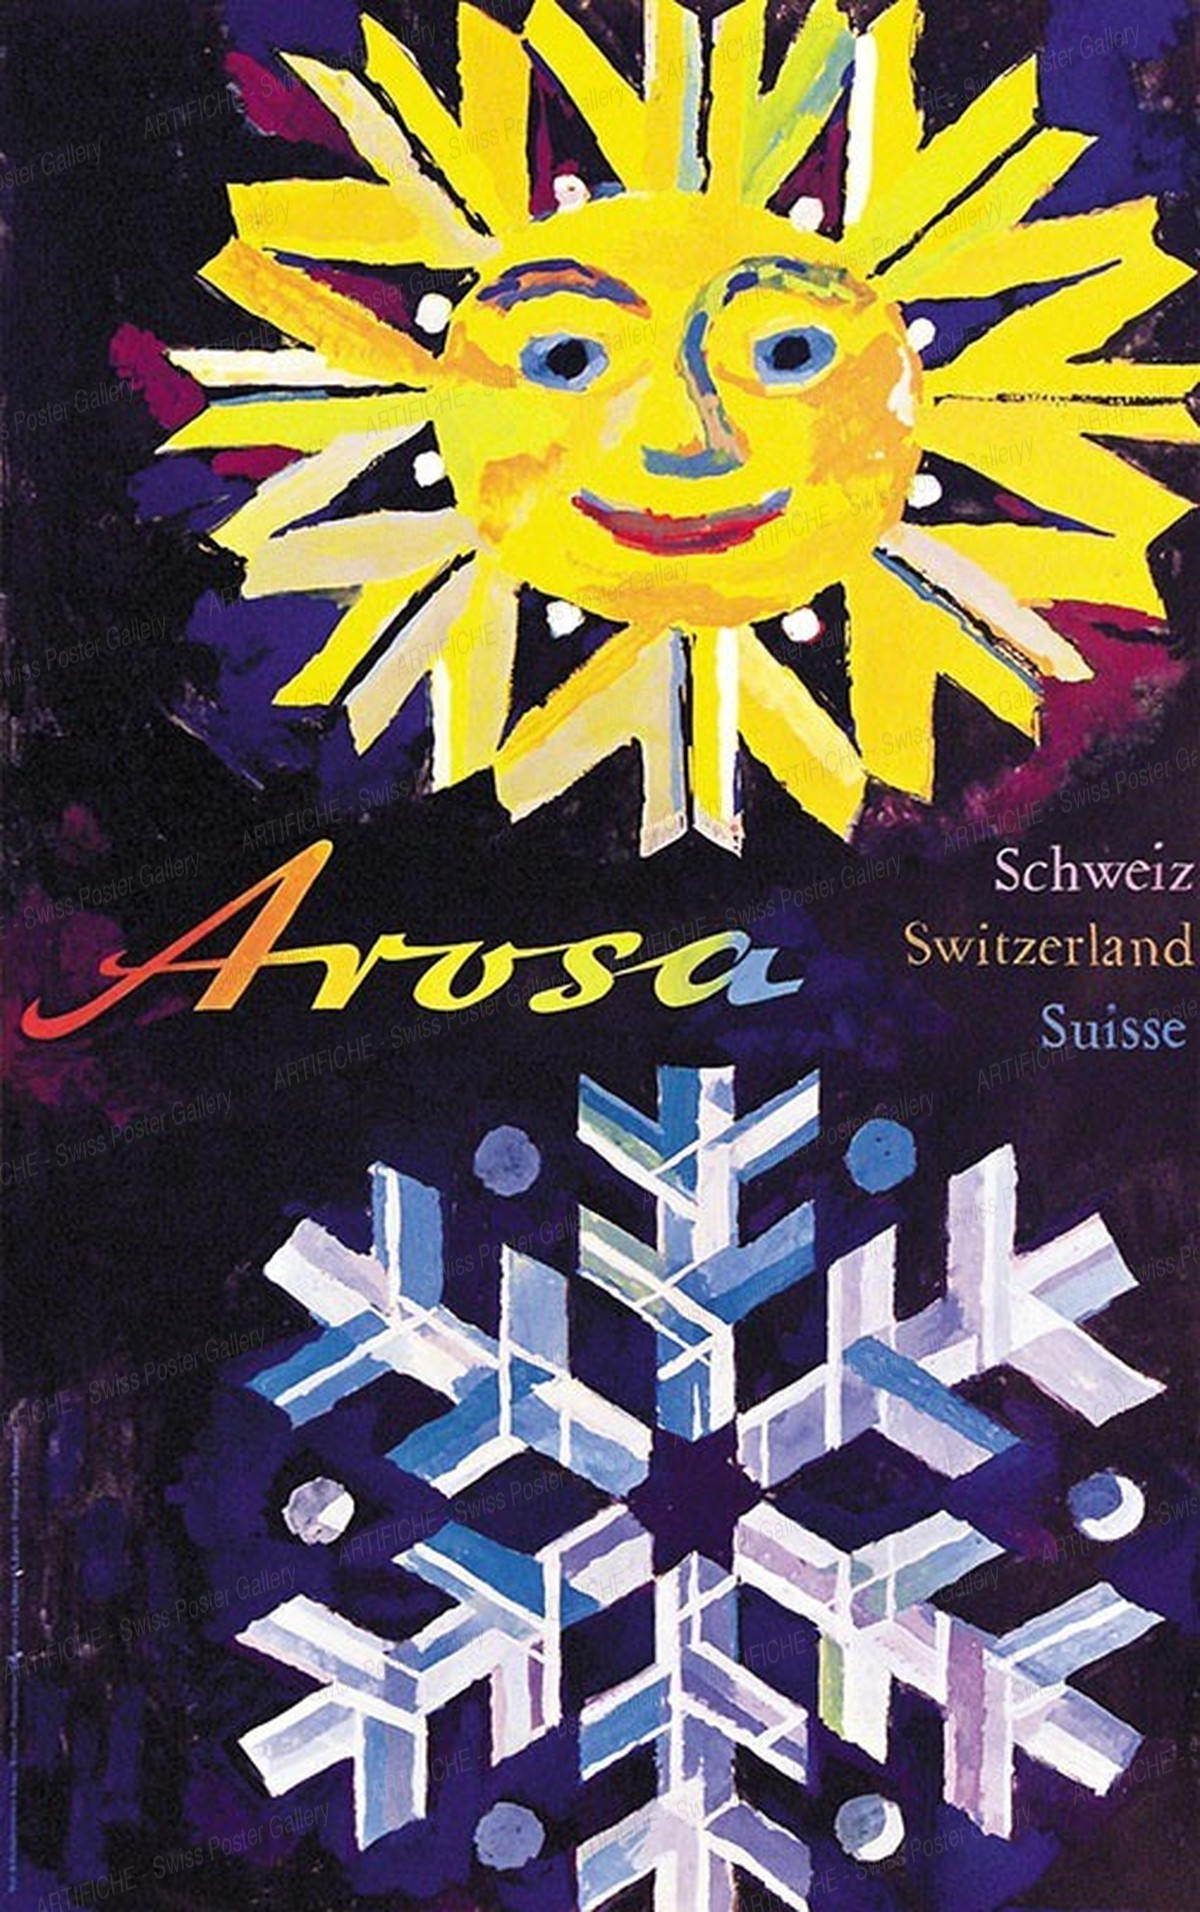 Arosa 6000 ft. Switzerland, Wolfgang Hausamann